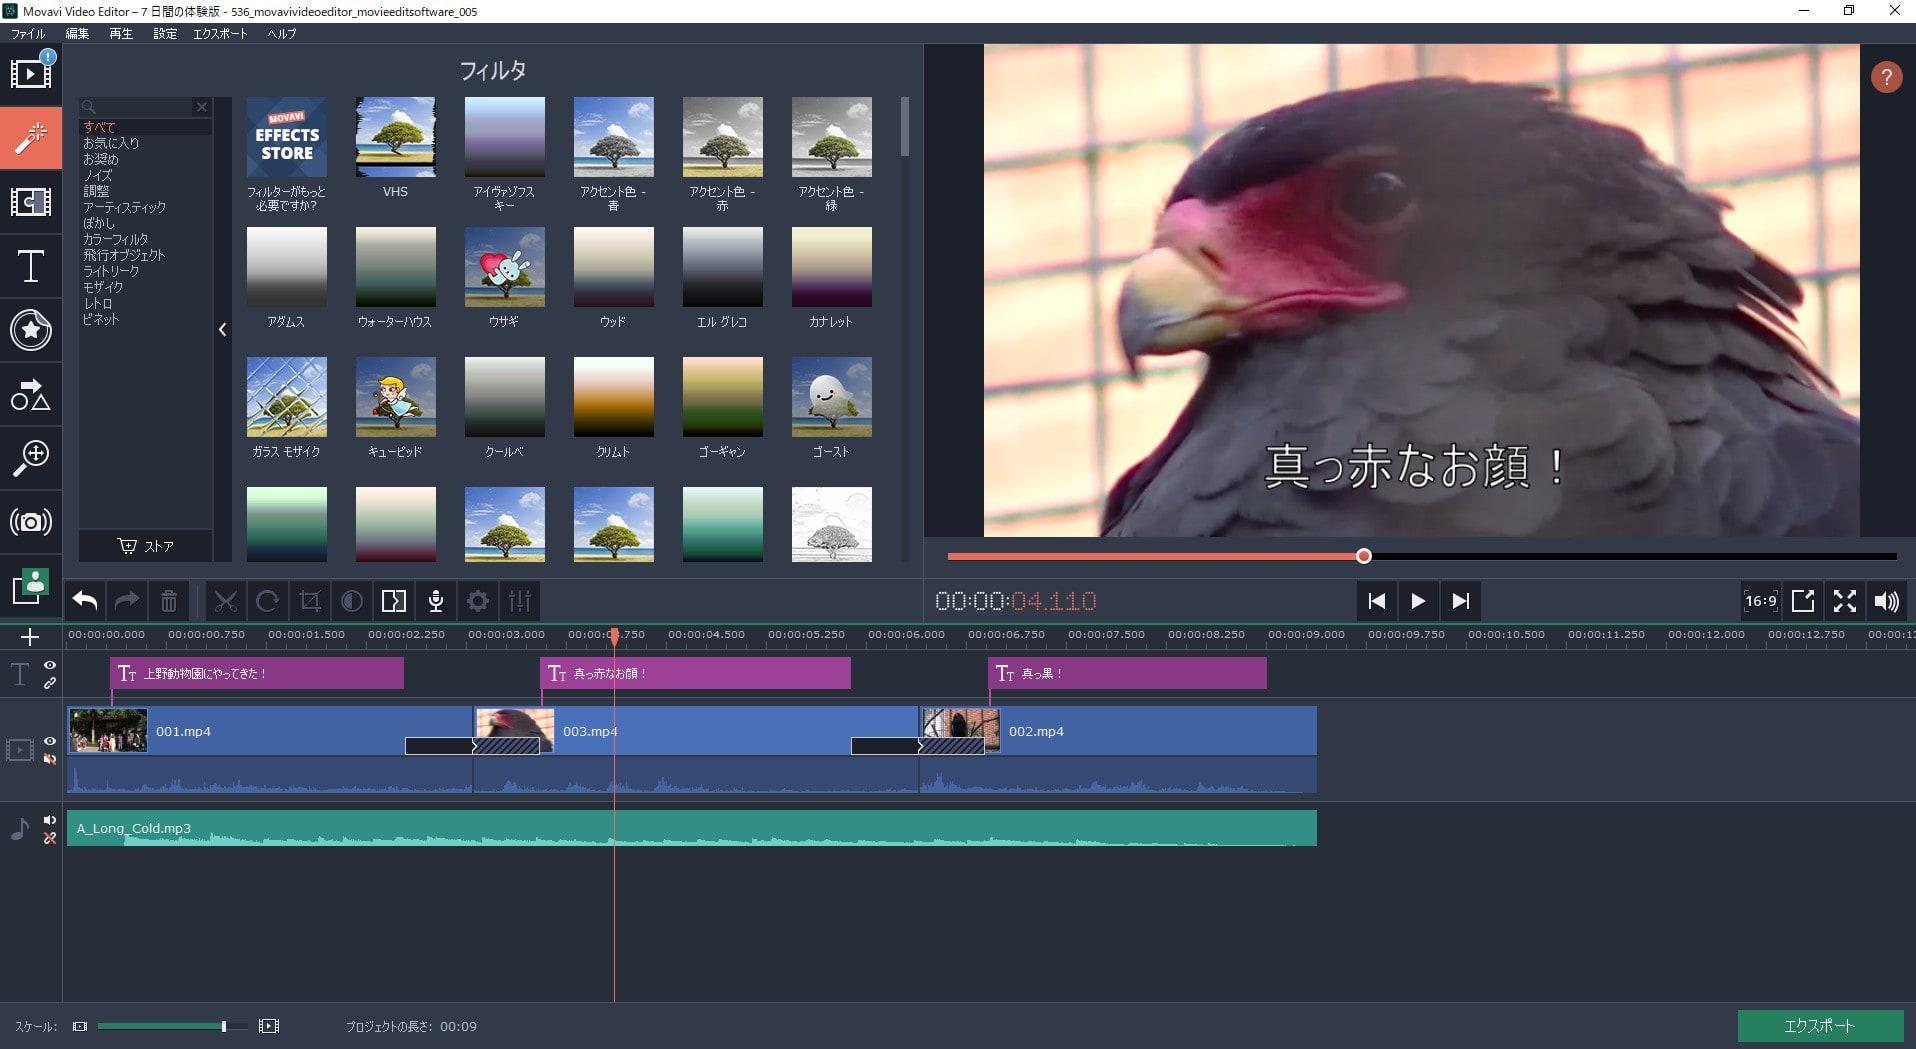 編集画面 動画編集ソフトMovavi Video Editor